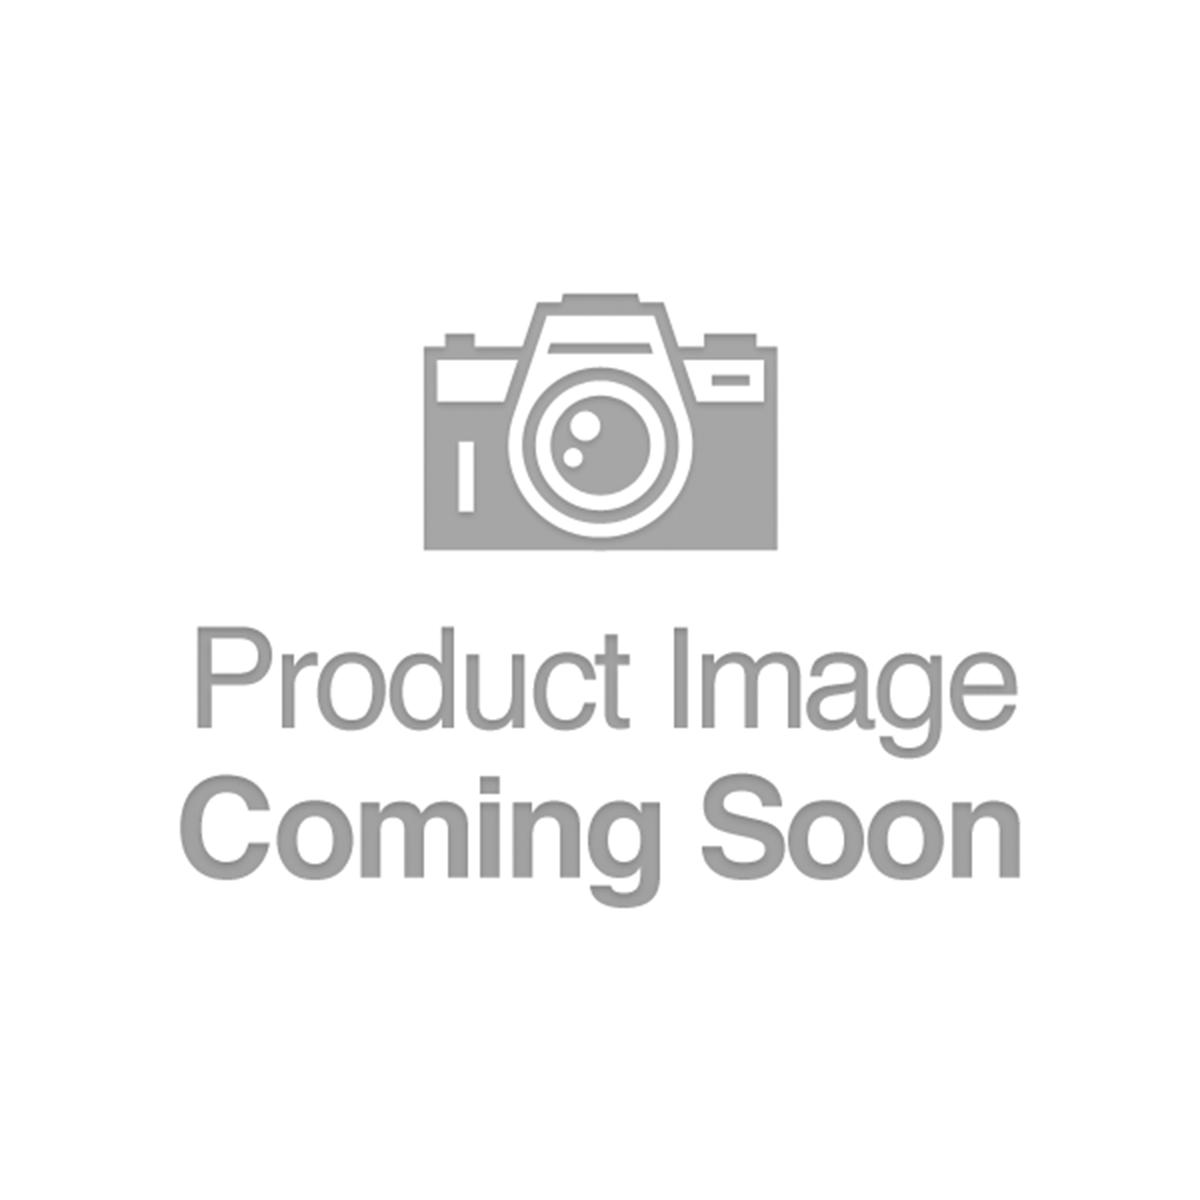 Ukiah - California - CH 10977 - FR 1801-1 - PMG 15